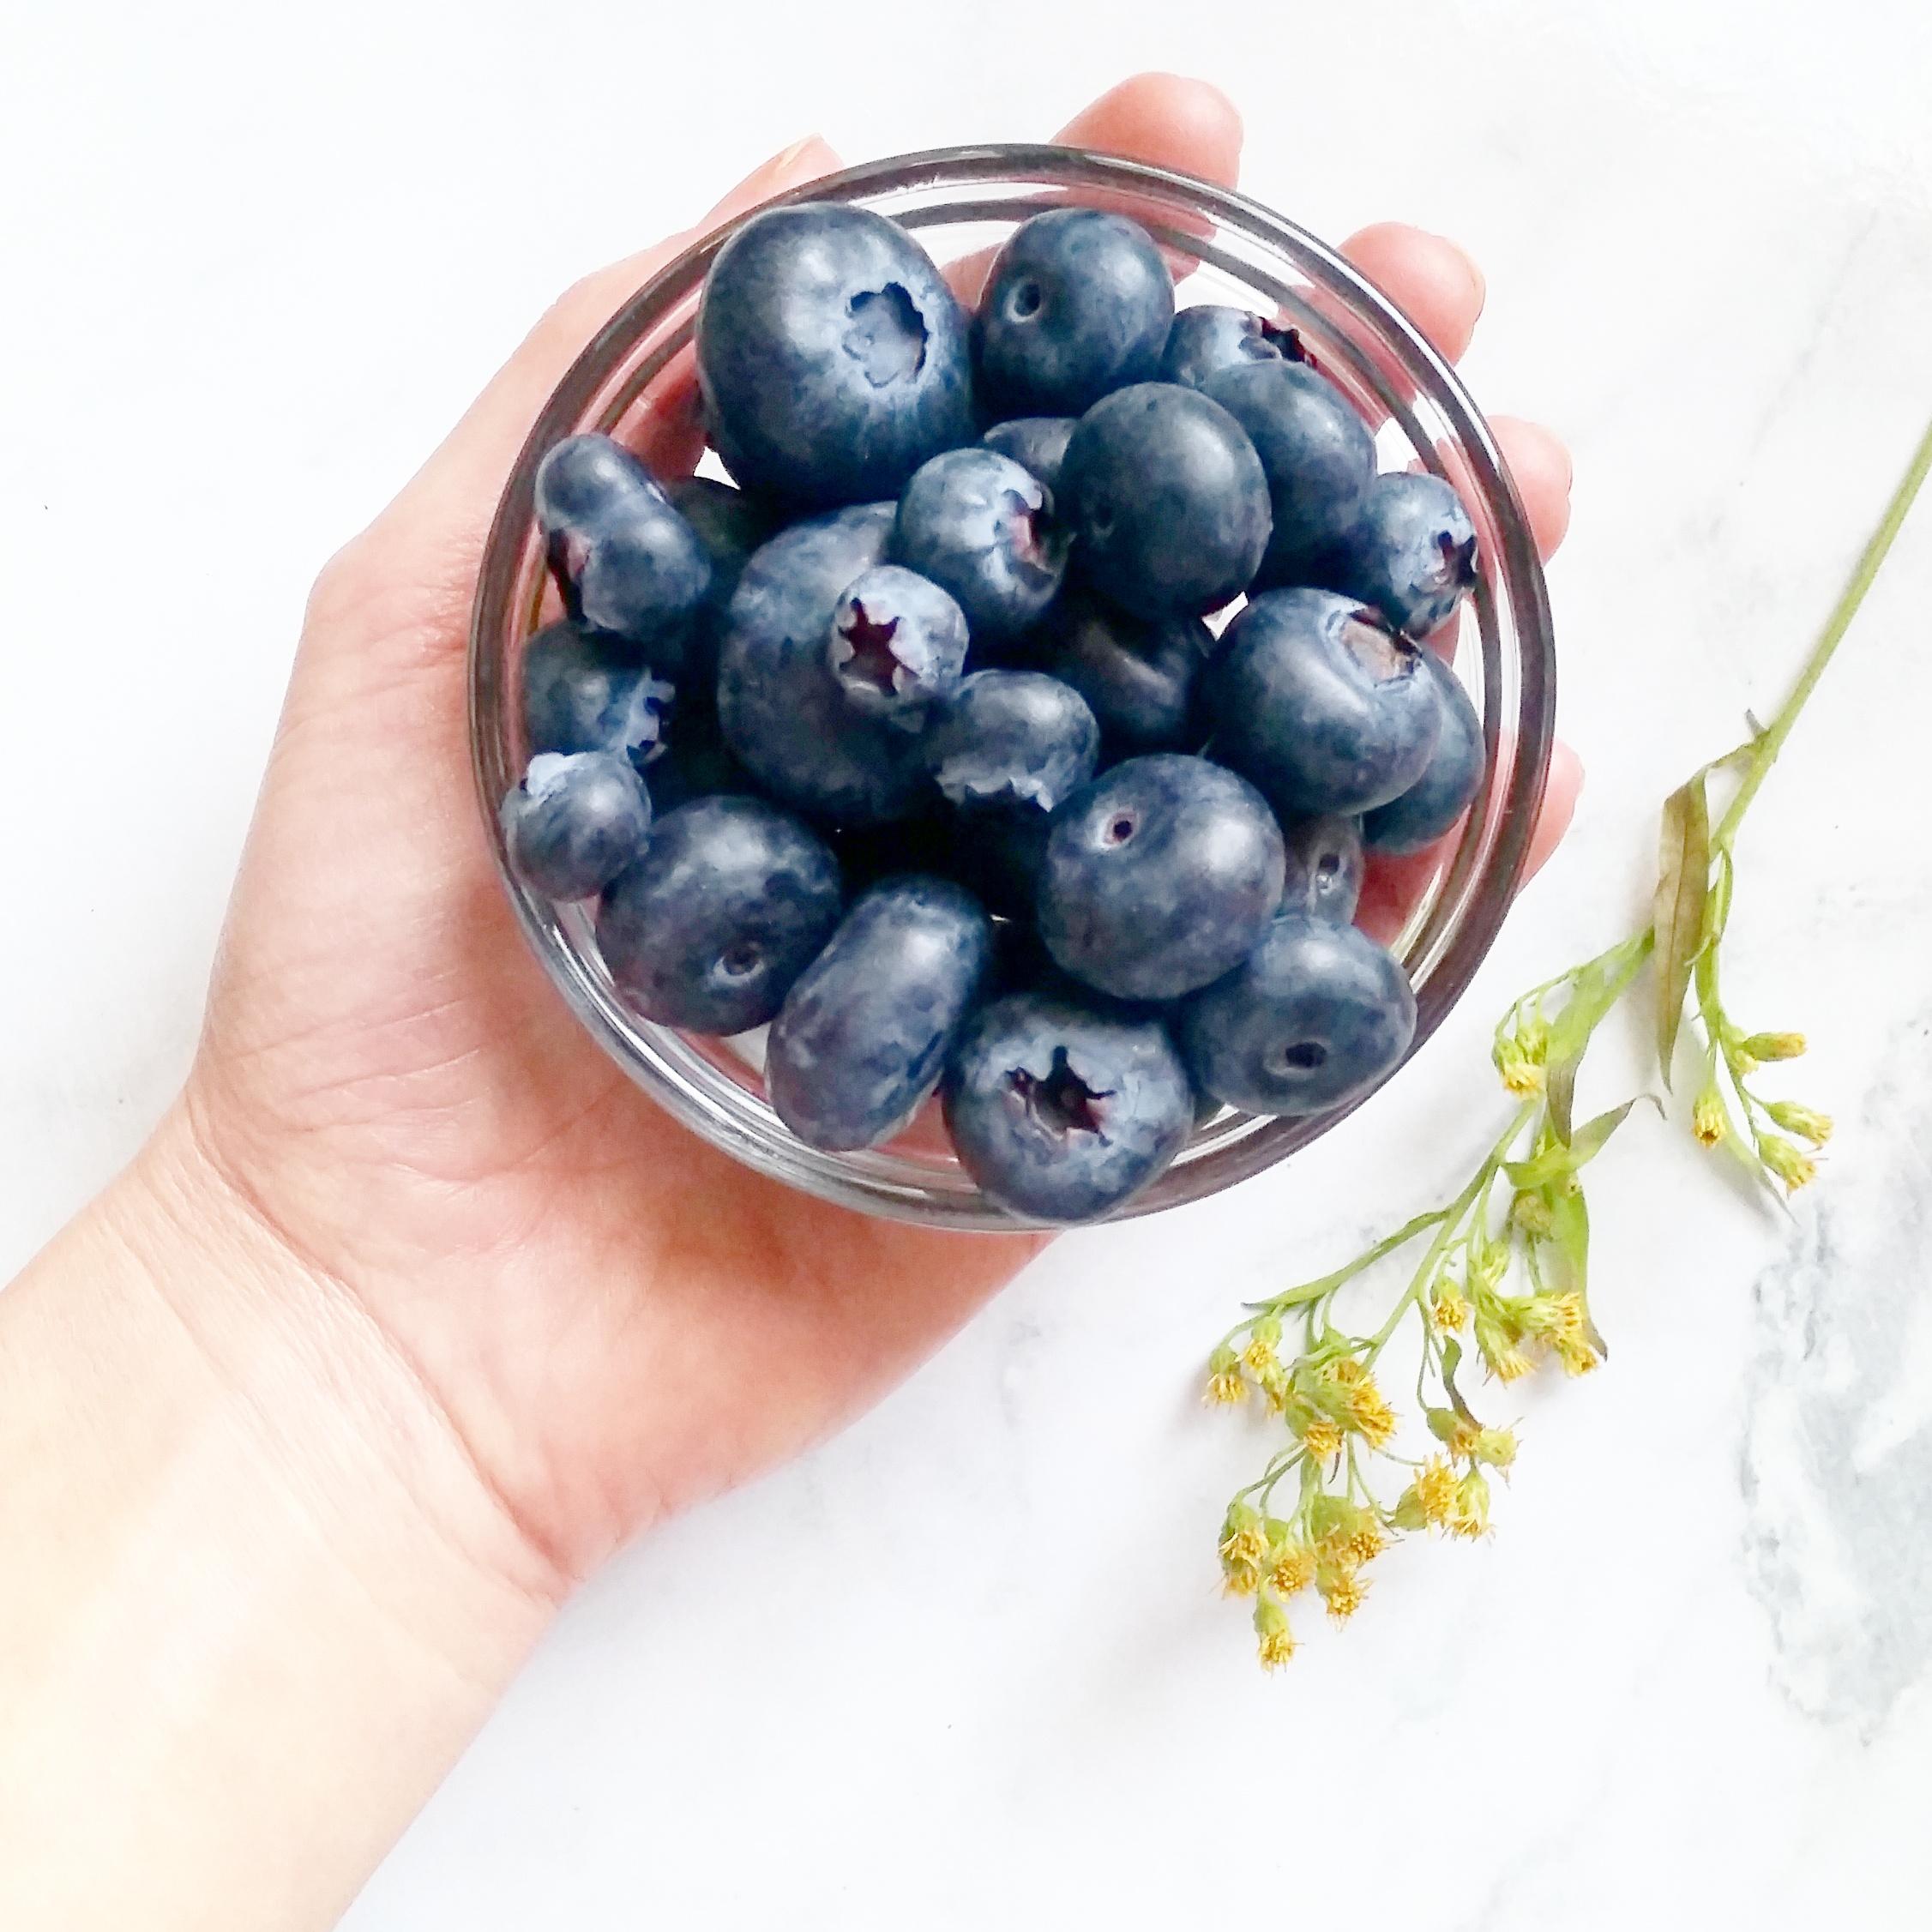 blueberries for depression